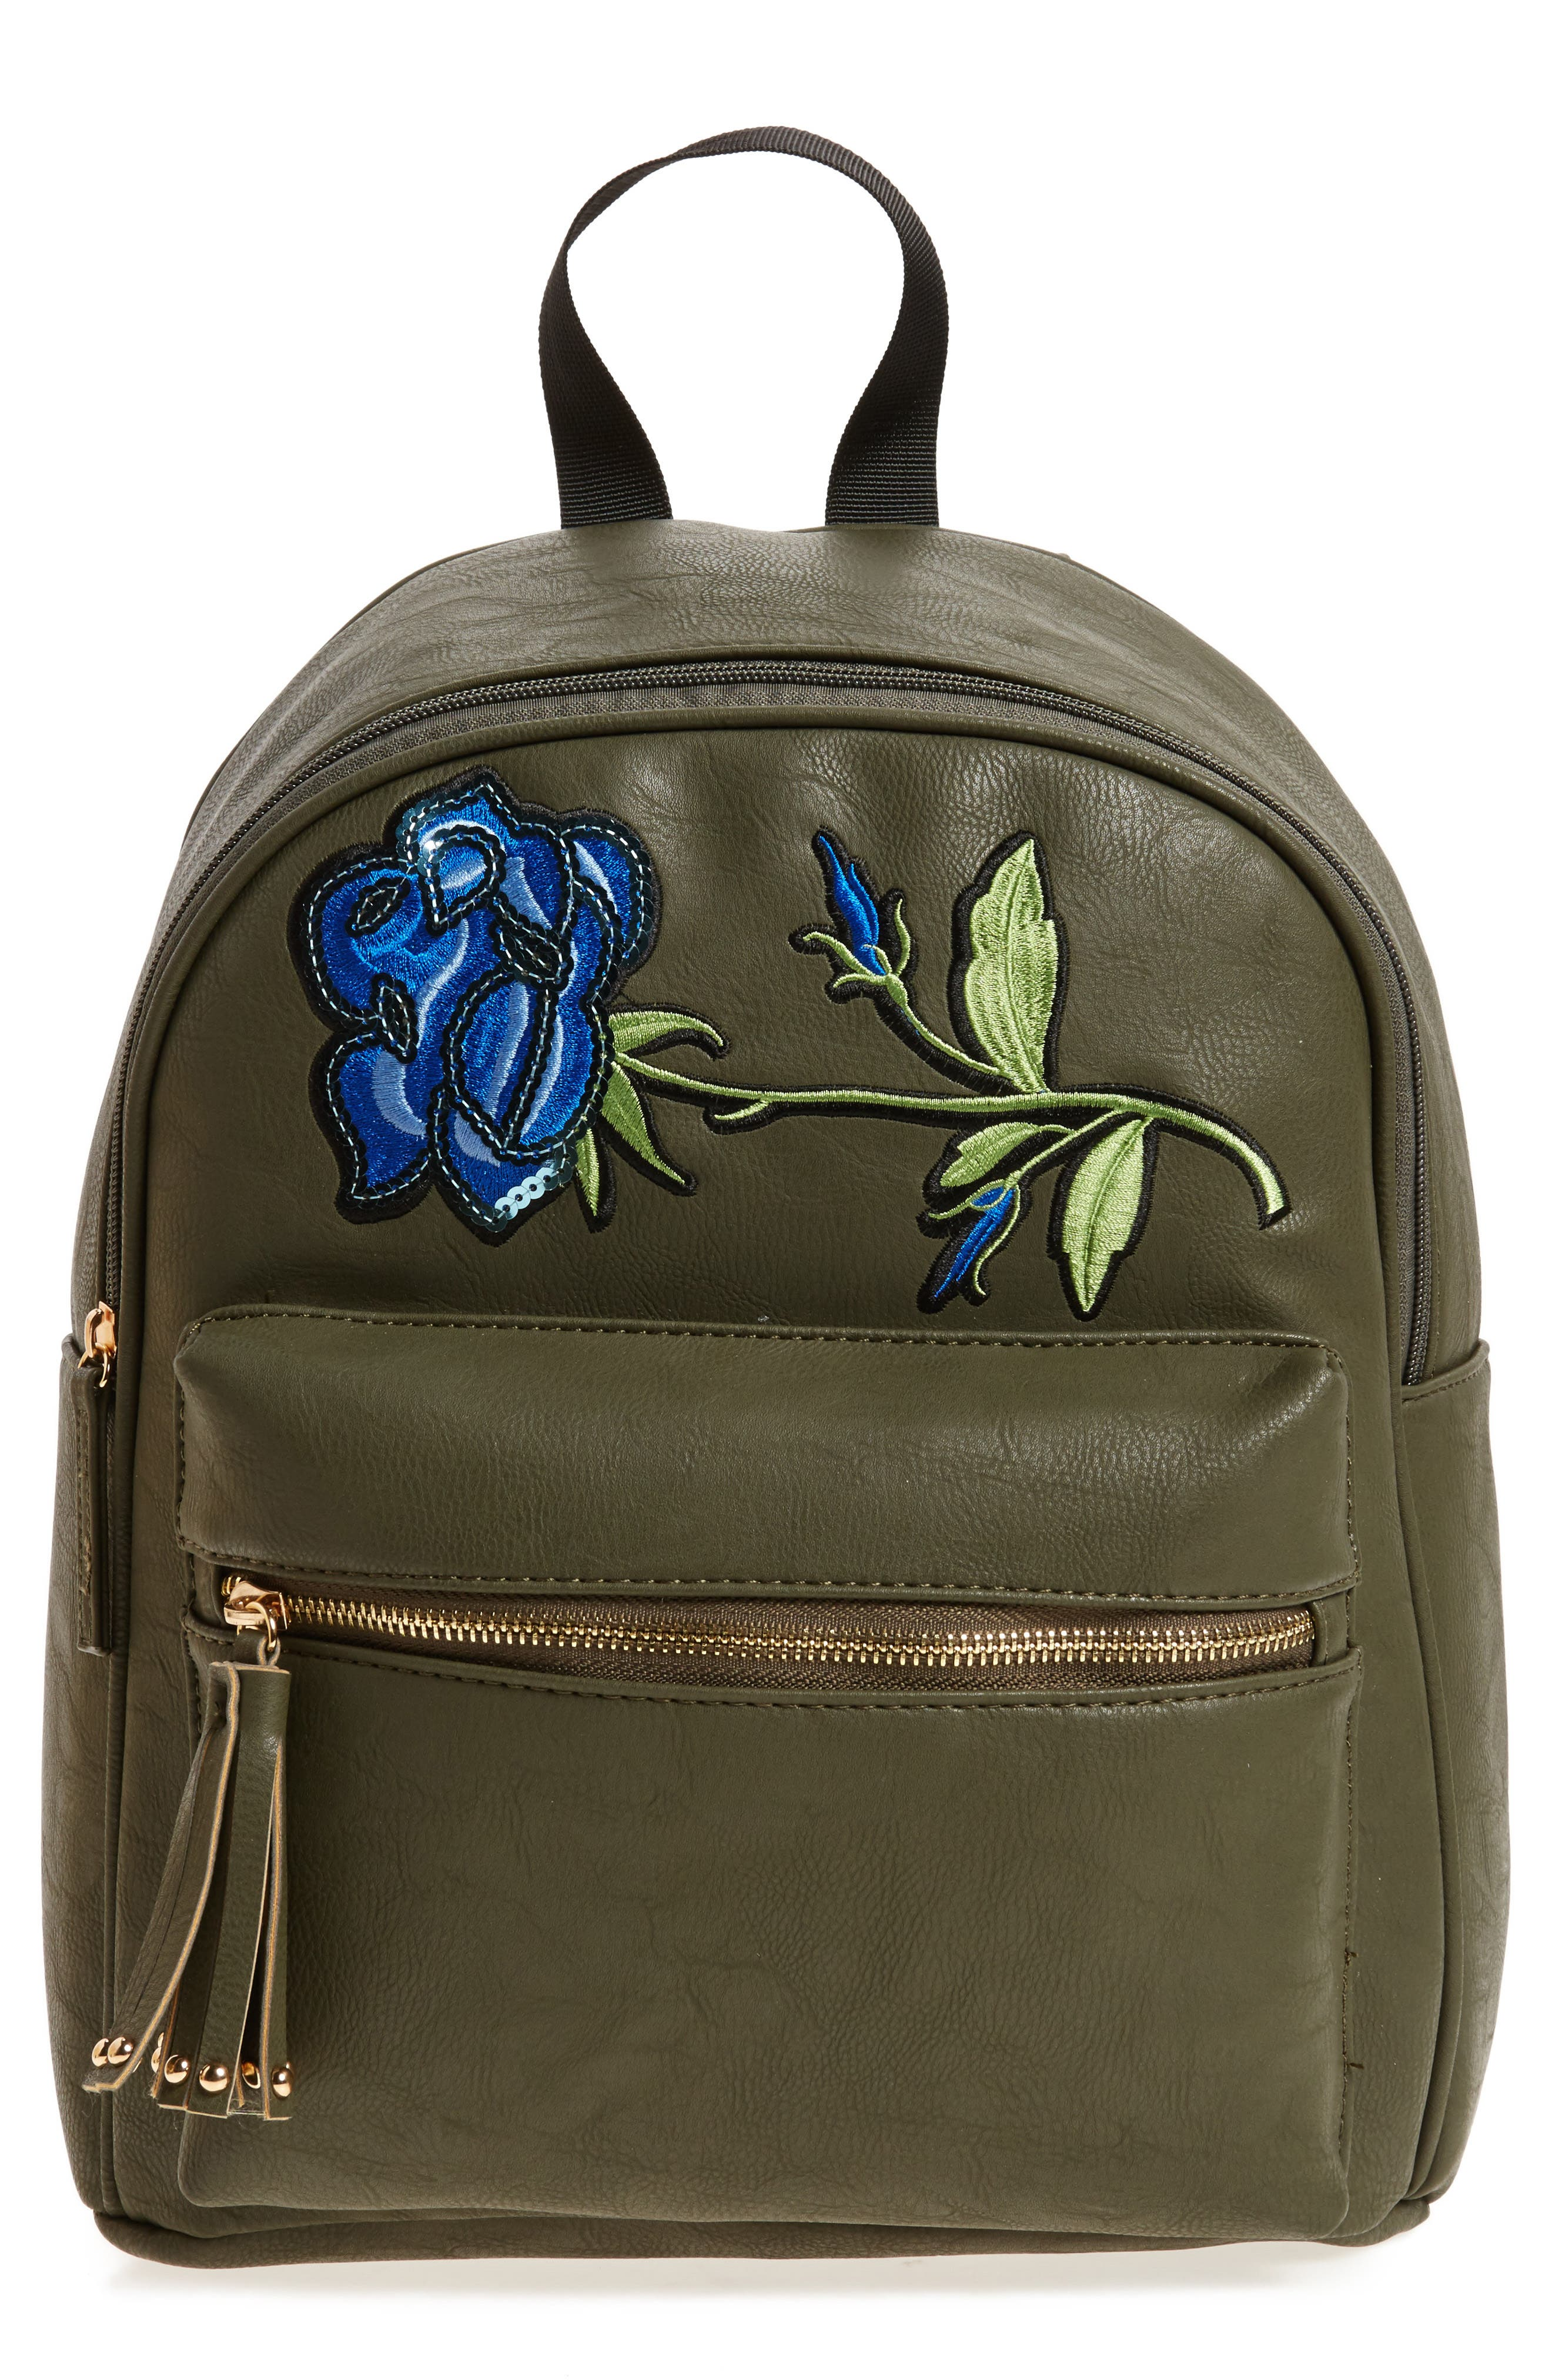 Alternate Image 1 Selected - OMG Sequin Rose Appliqué Faux Leather Backpack (Girls)